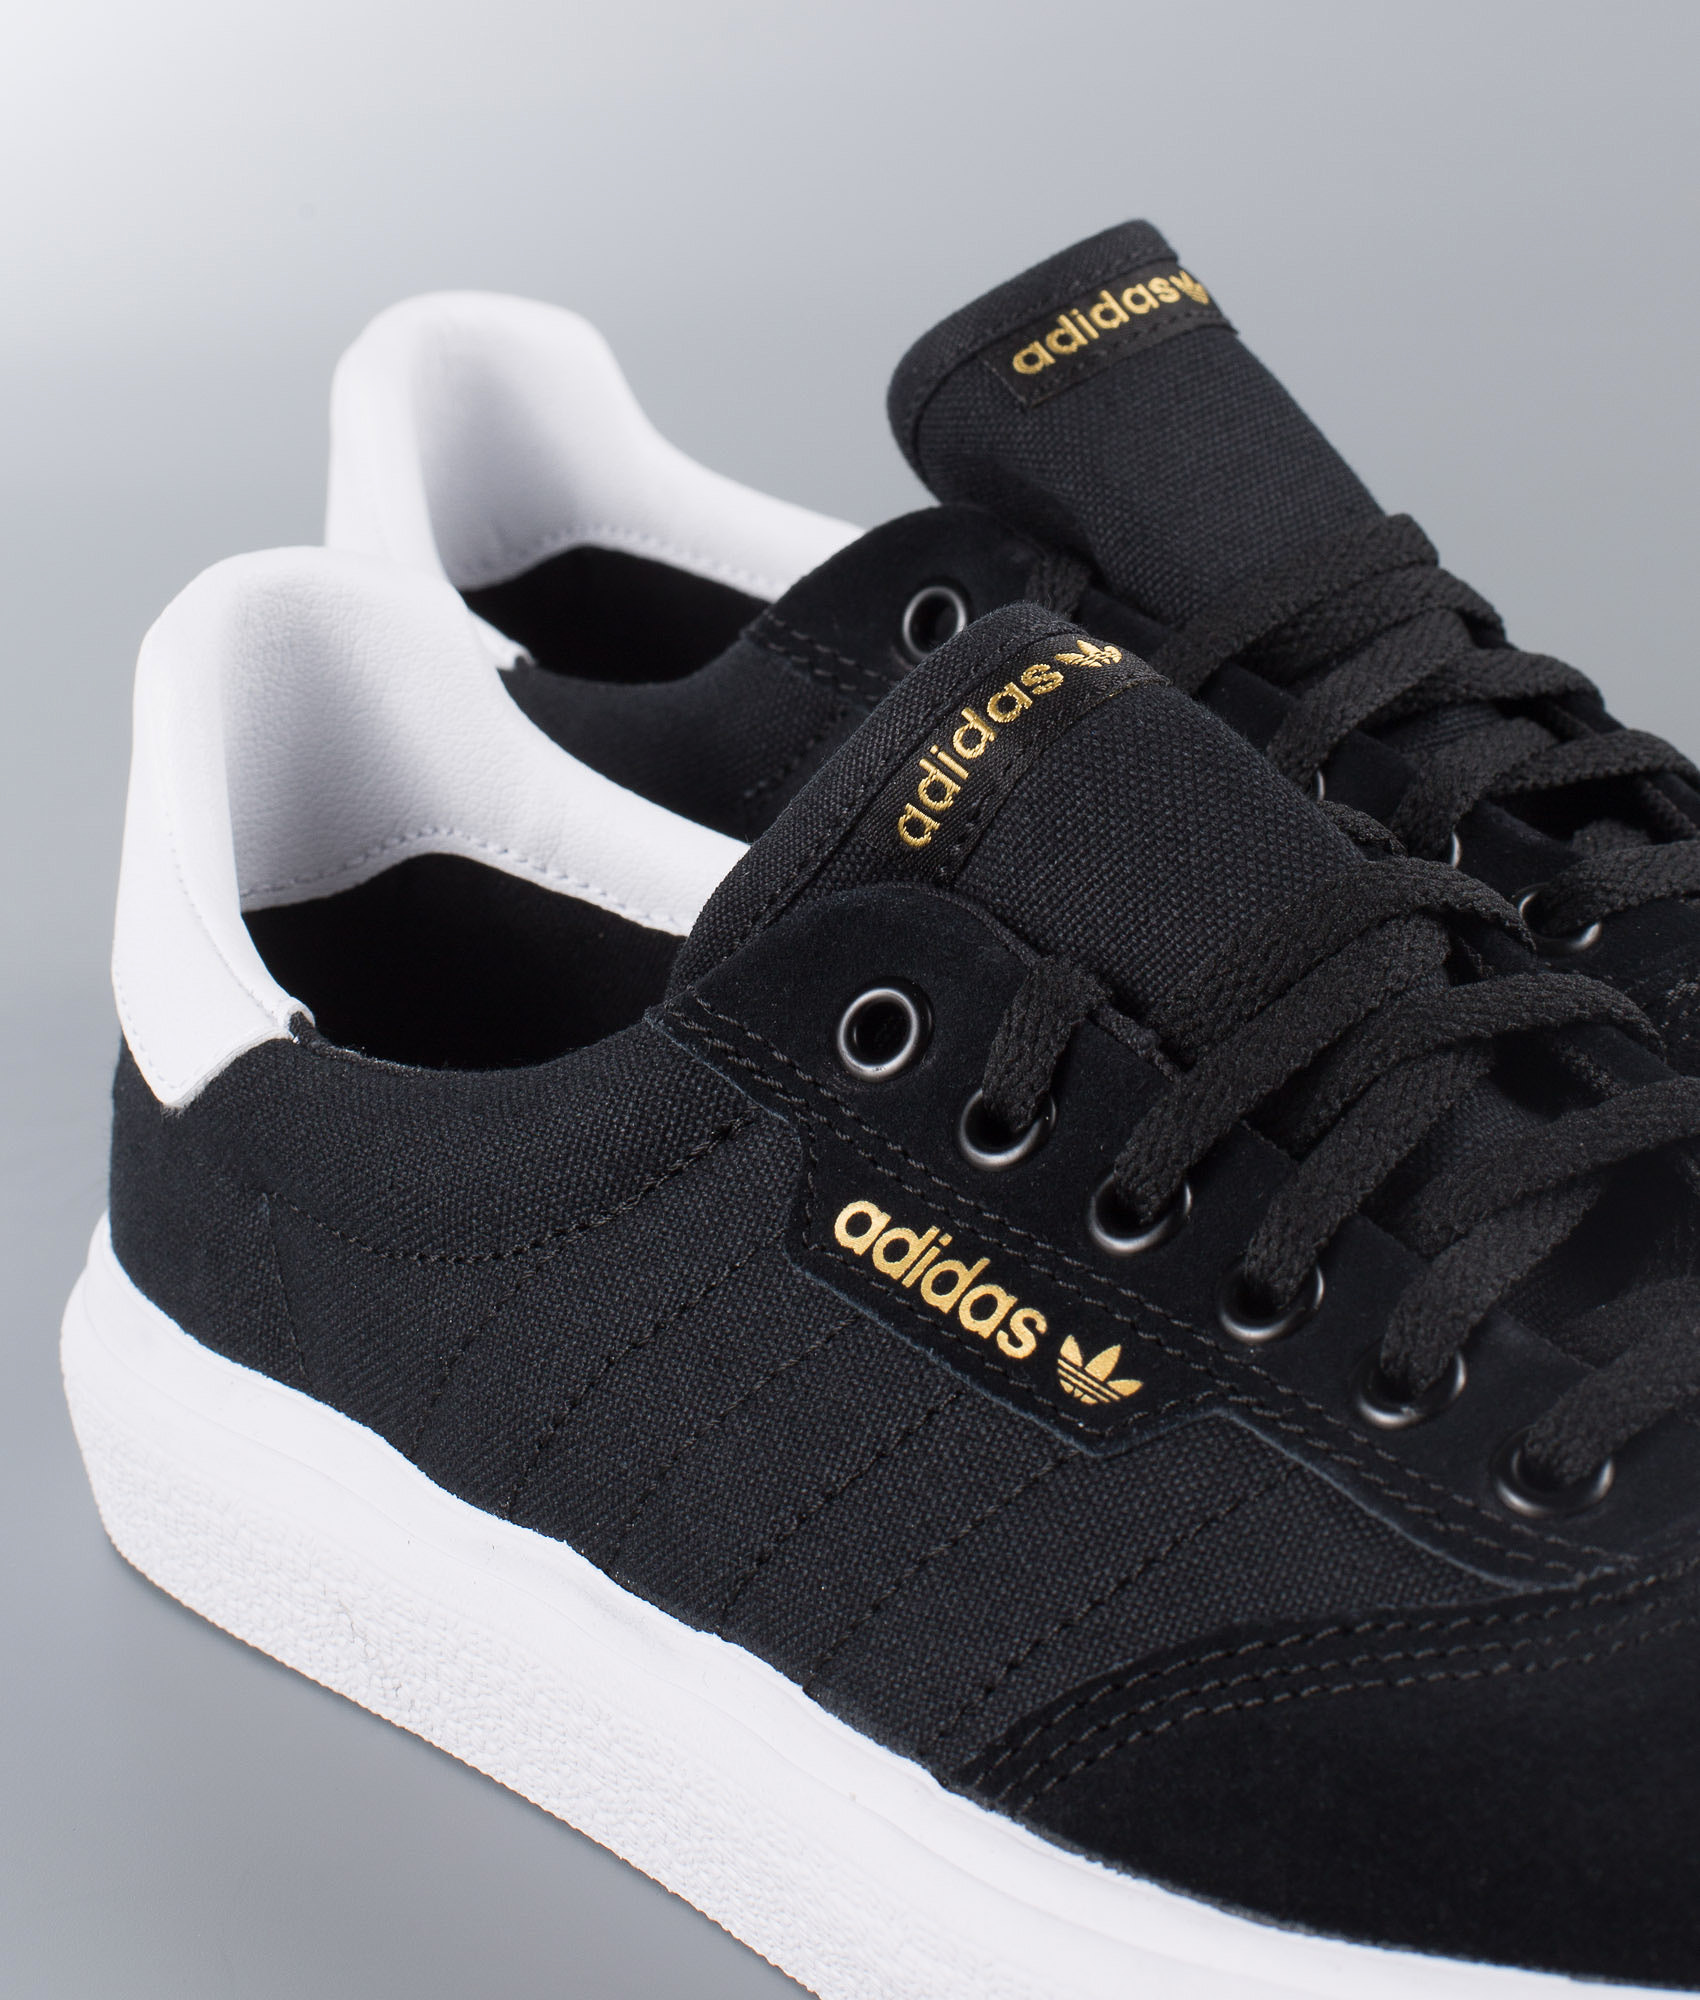 d48bb7ec99f85d Adidas Skateboarding 3Mc Schuhe Core Black Ftwr White Core Black ...